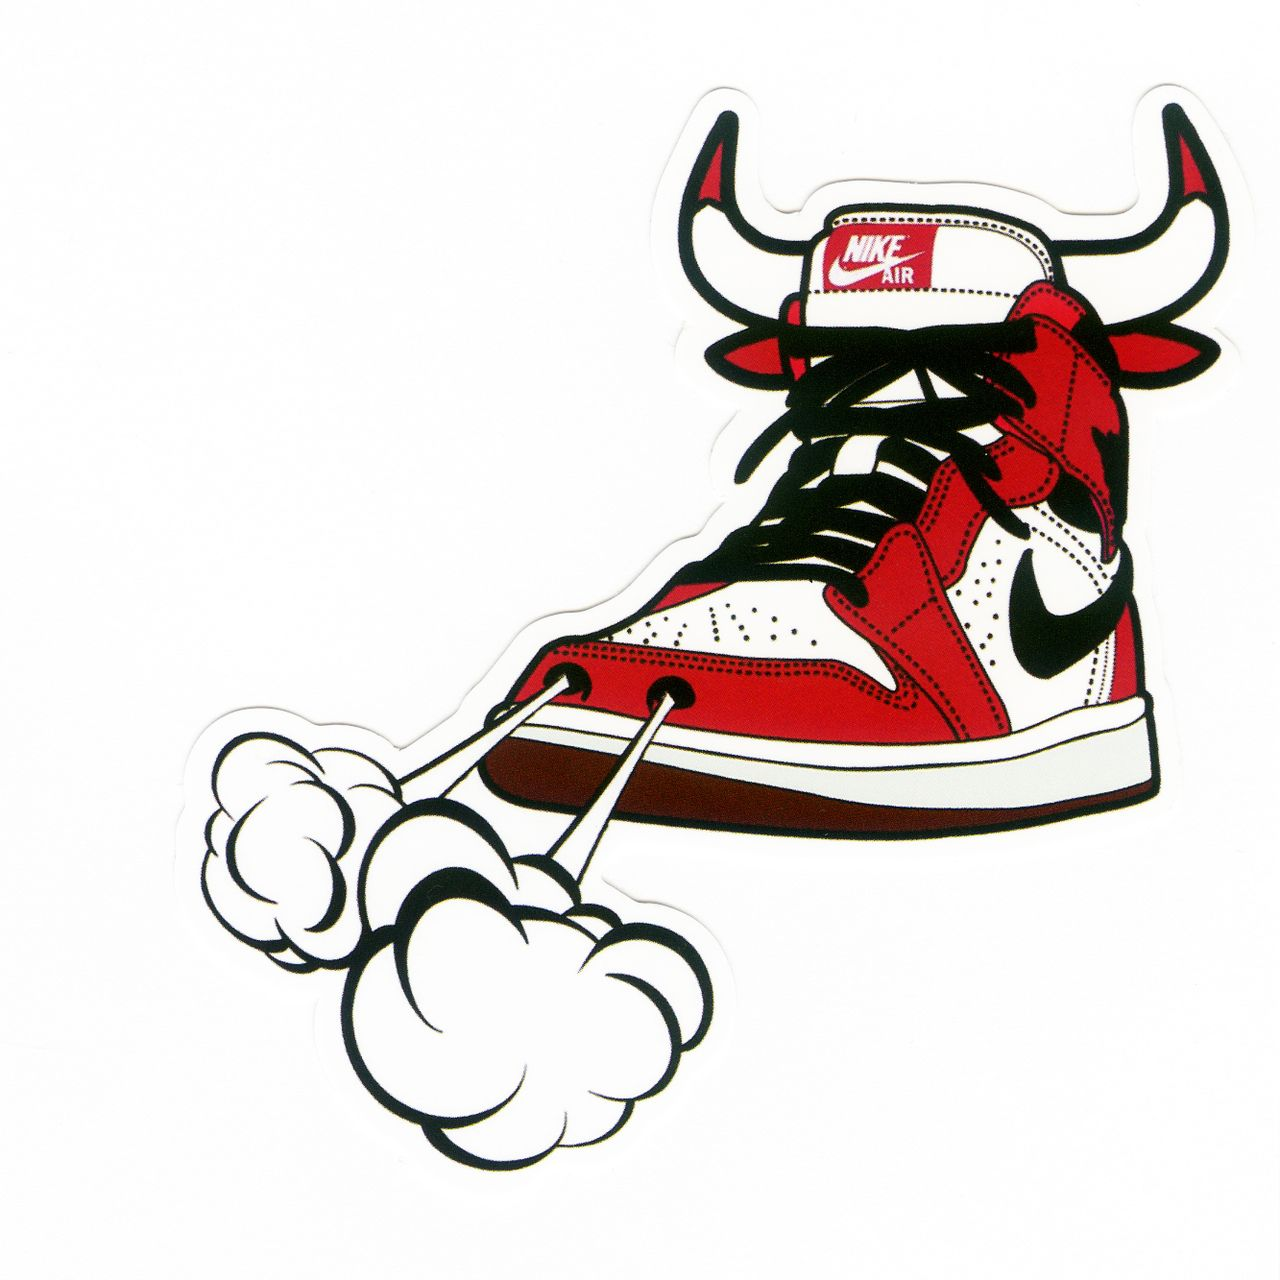 1280x1280 Jordan 1 Clip Art